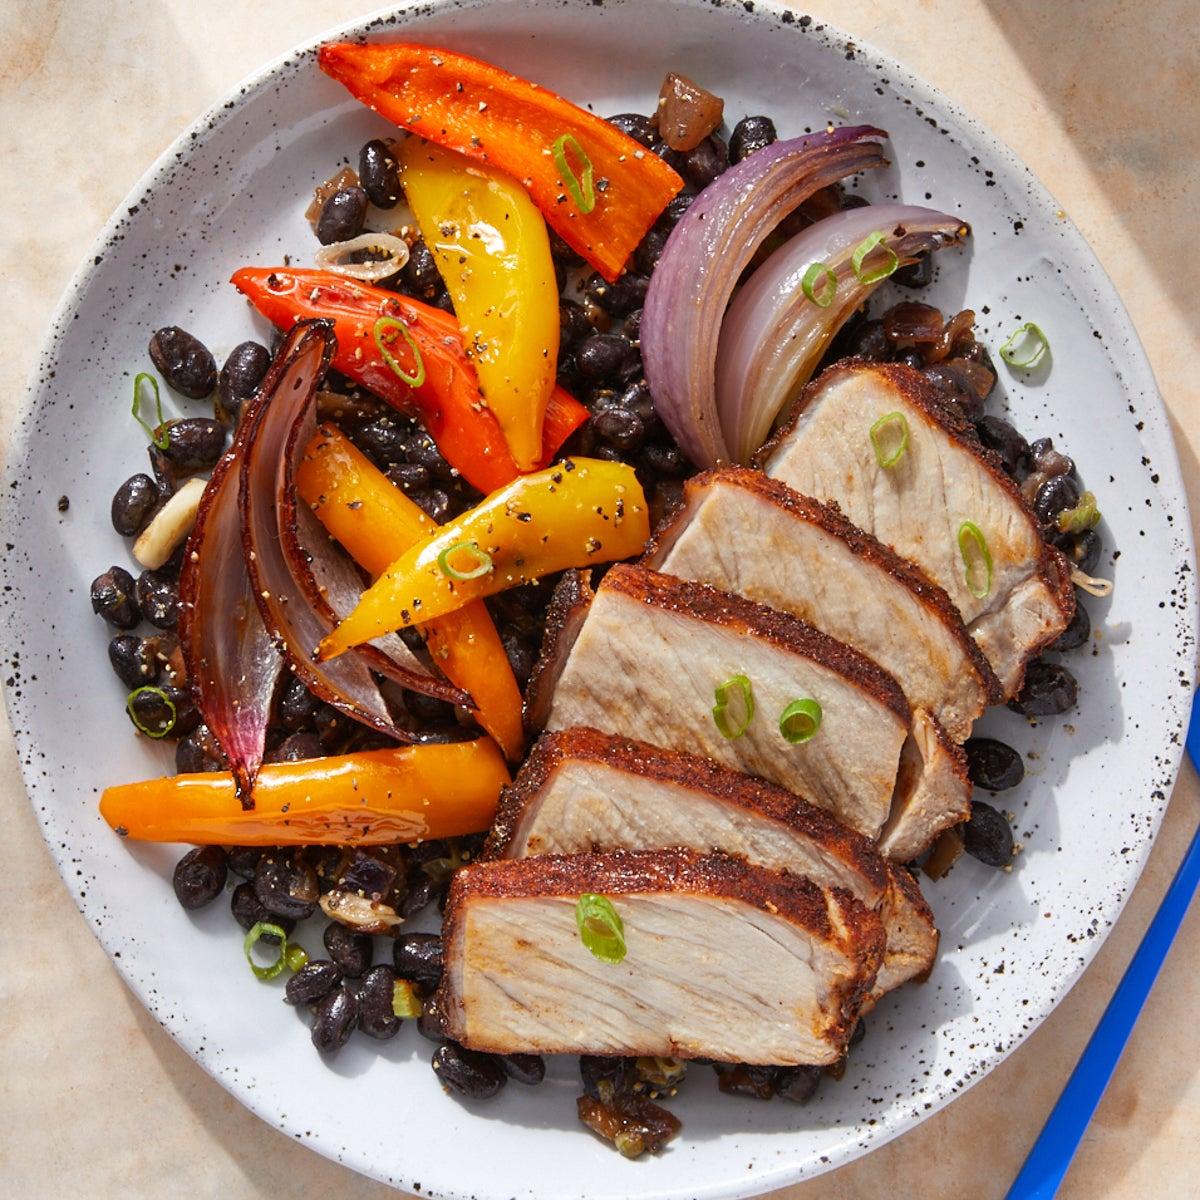 Mexican-Spiced Pork Roast with Caramelized Onion & Black Beans